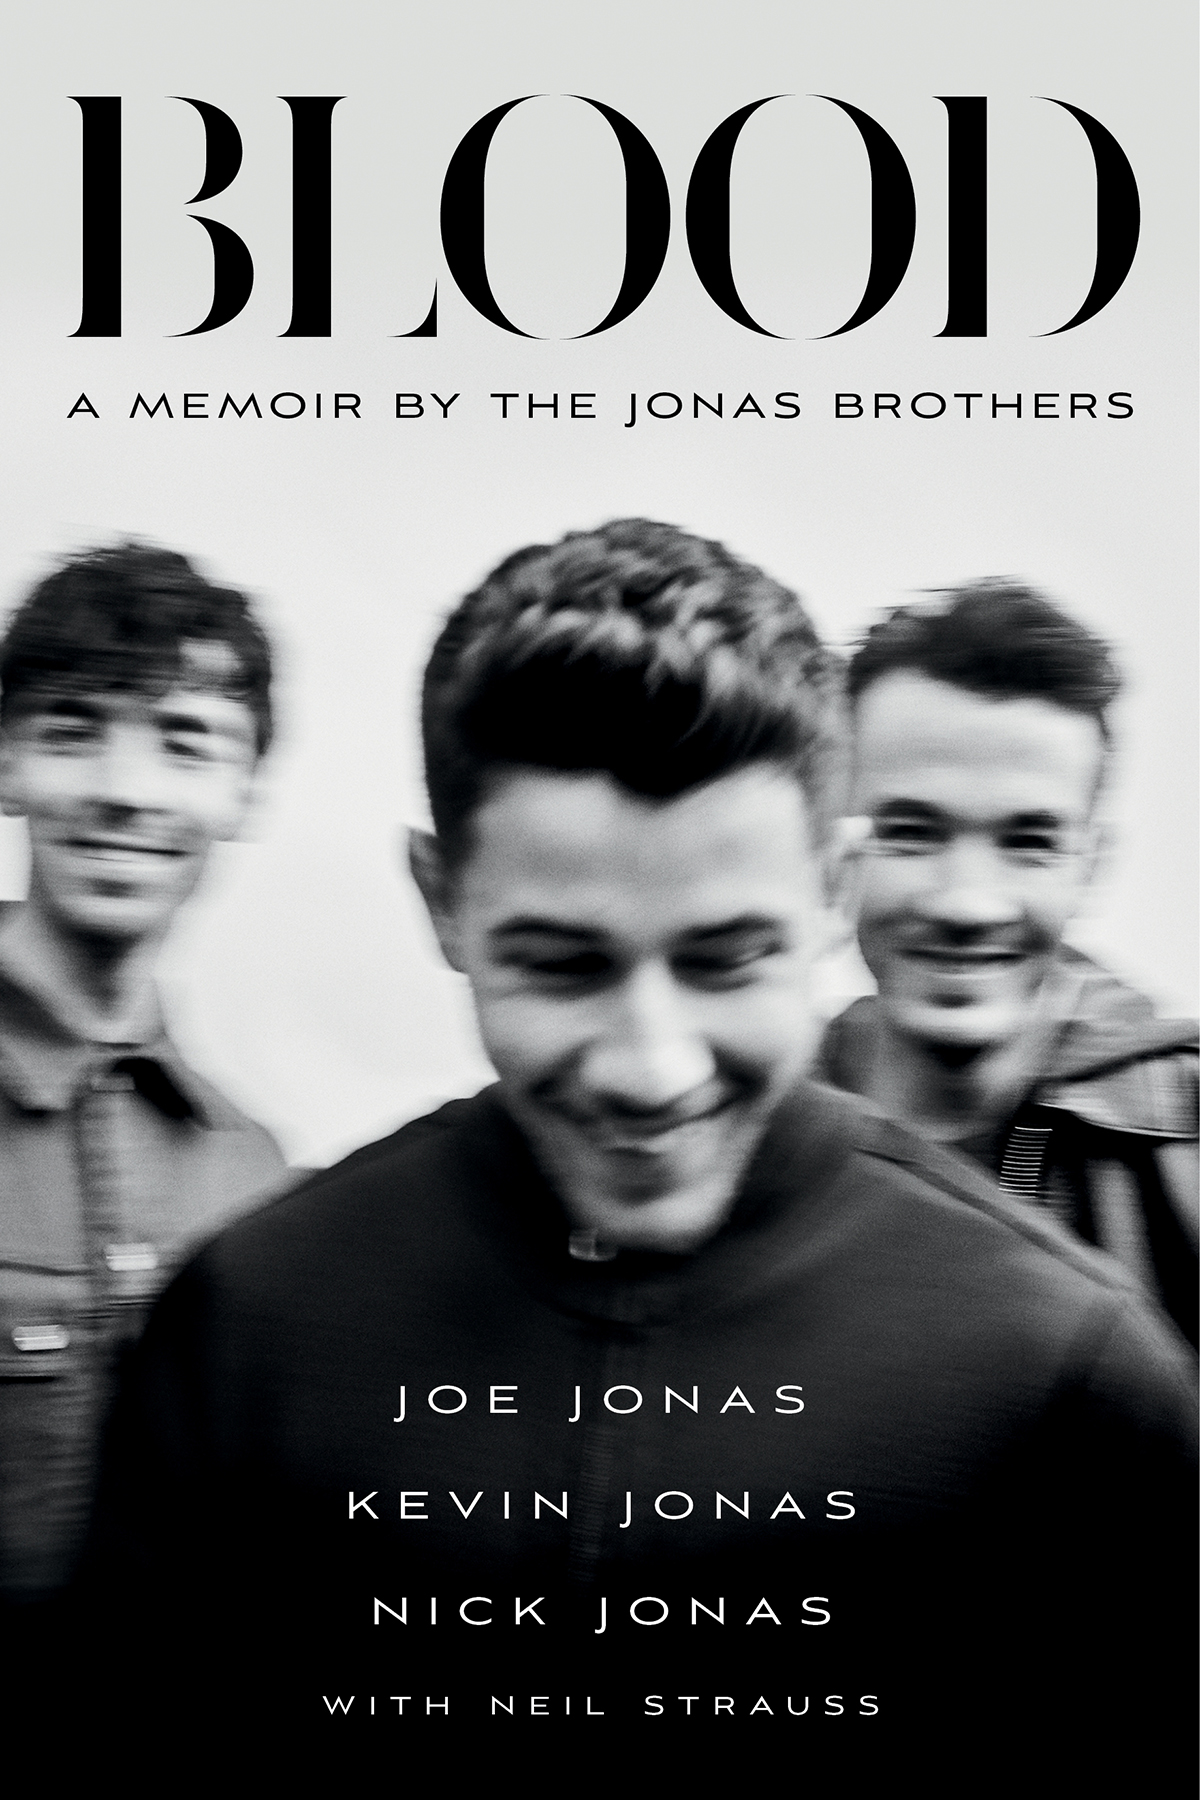 blood jonas brothers